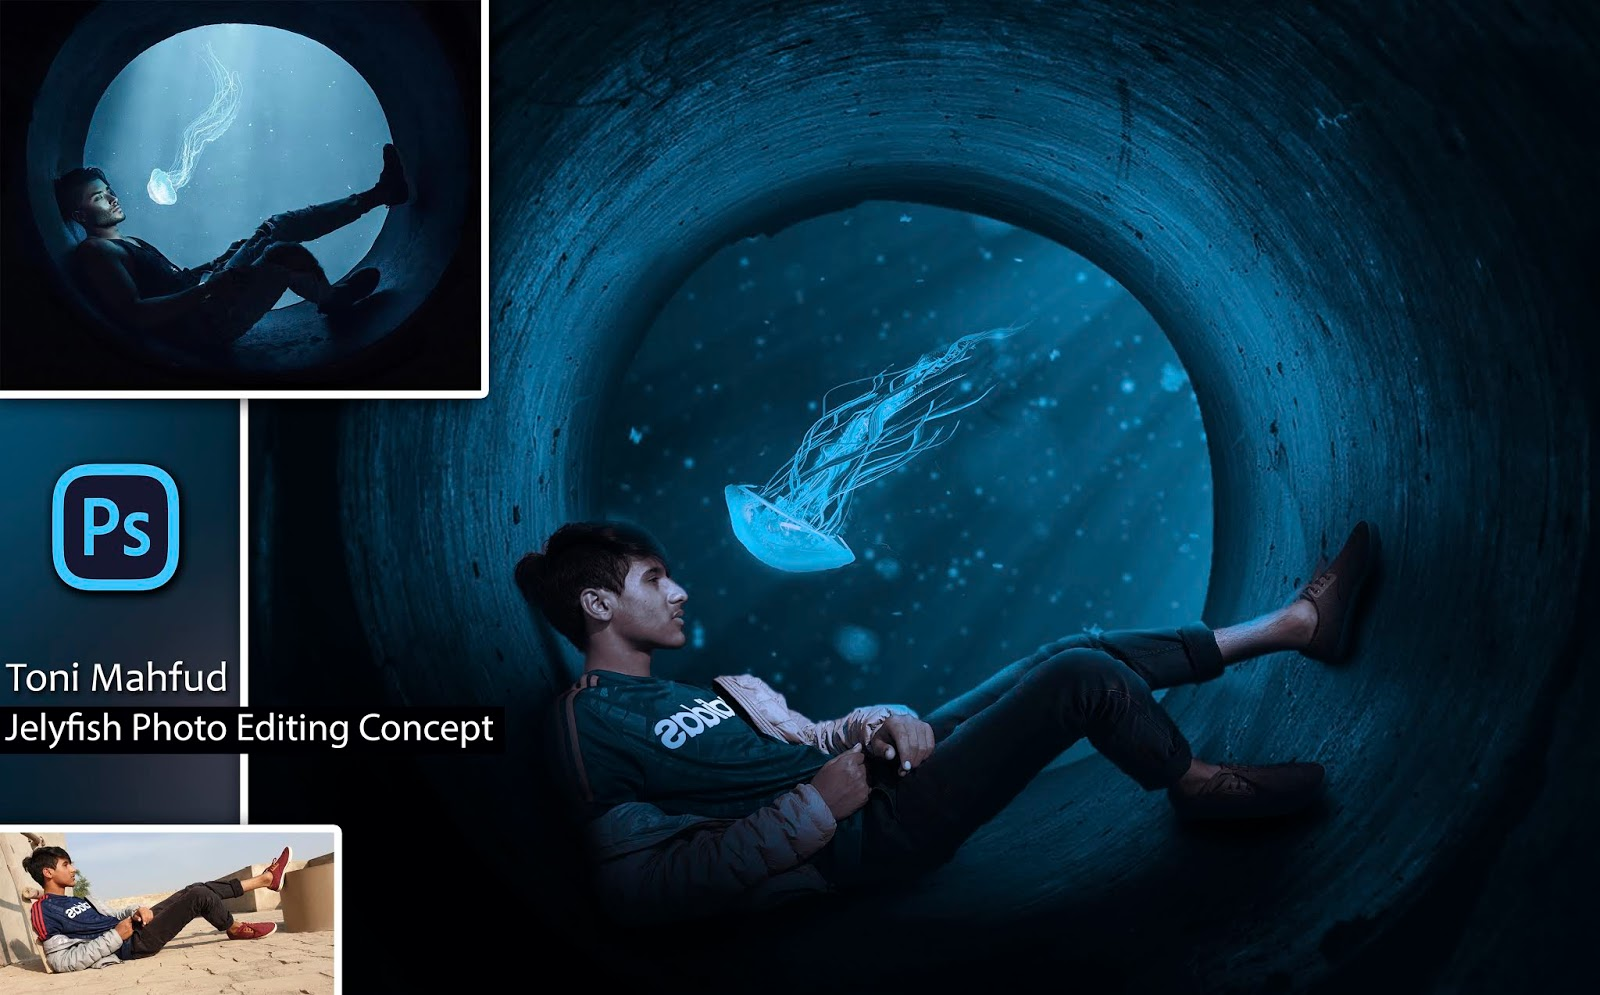 Jellyfish Concept | Toni Mahfud Style Photo Editing | How to Edit Photo Like Toni Mahfud in Photoshop cc